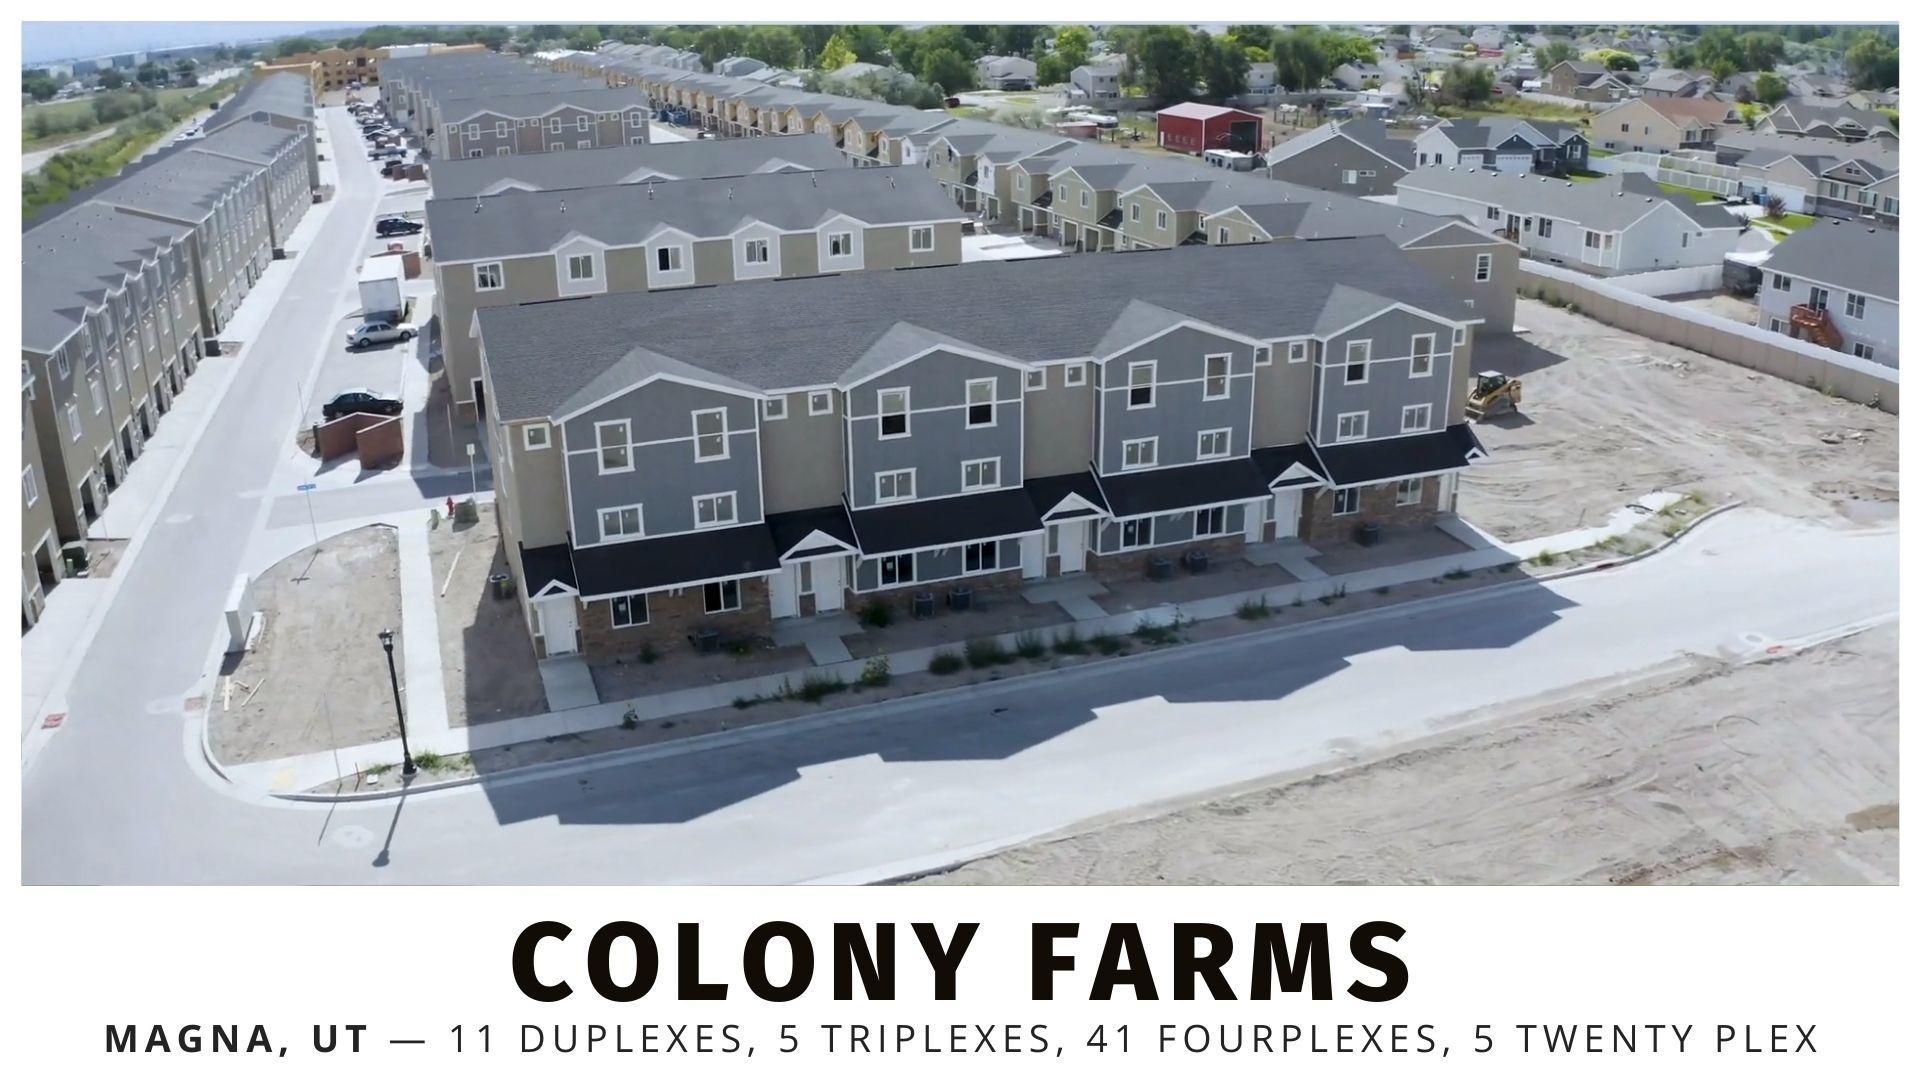 Colony Farms Development in Magna, Utah